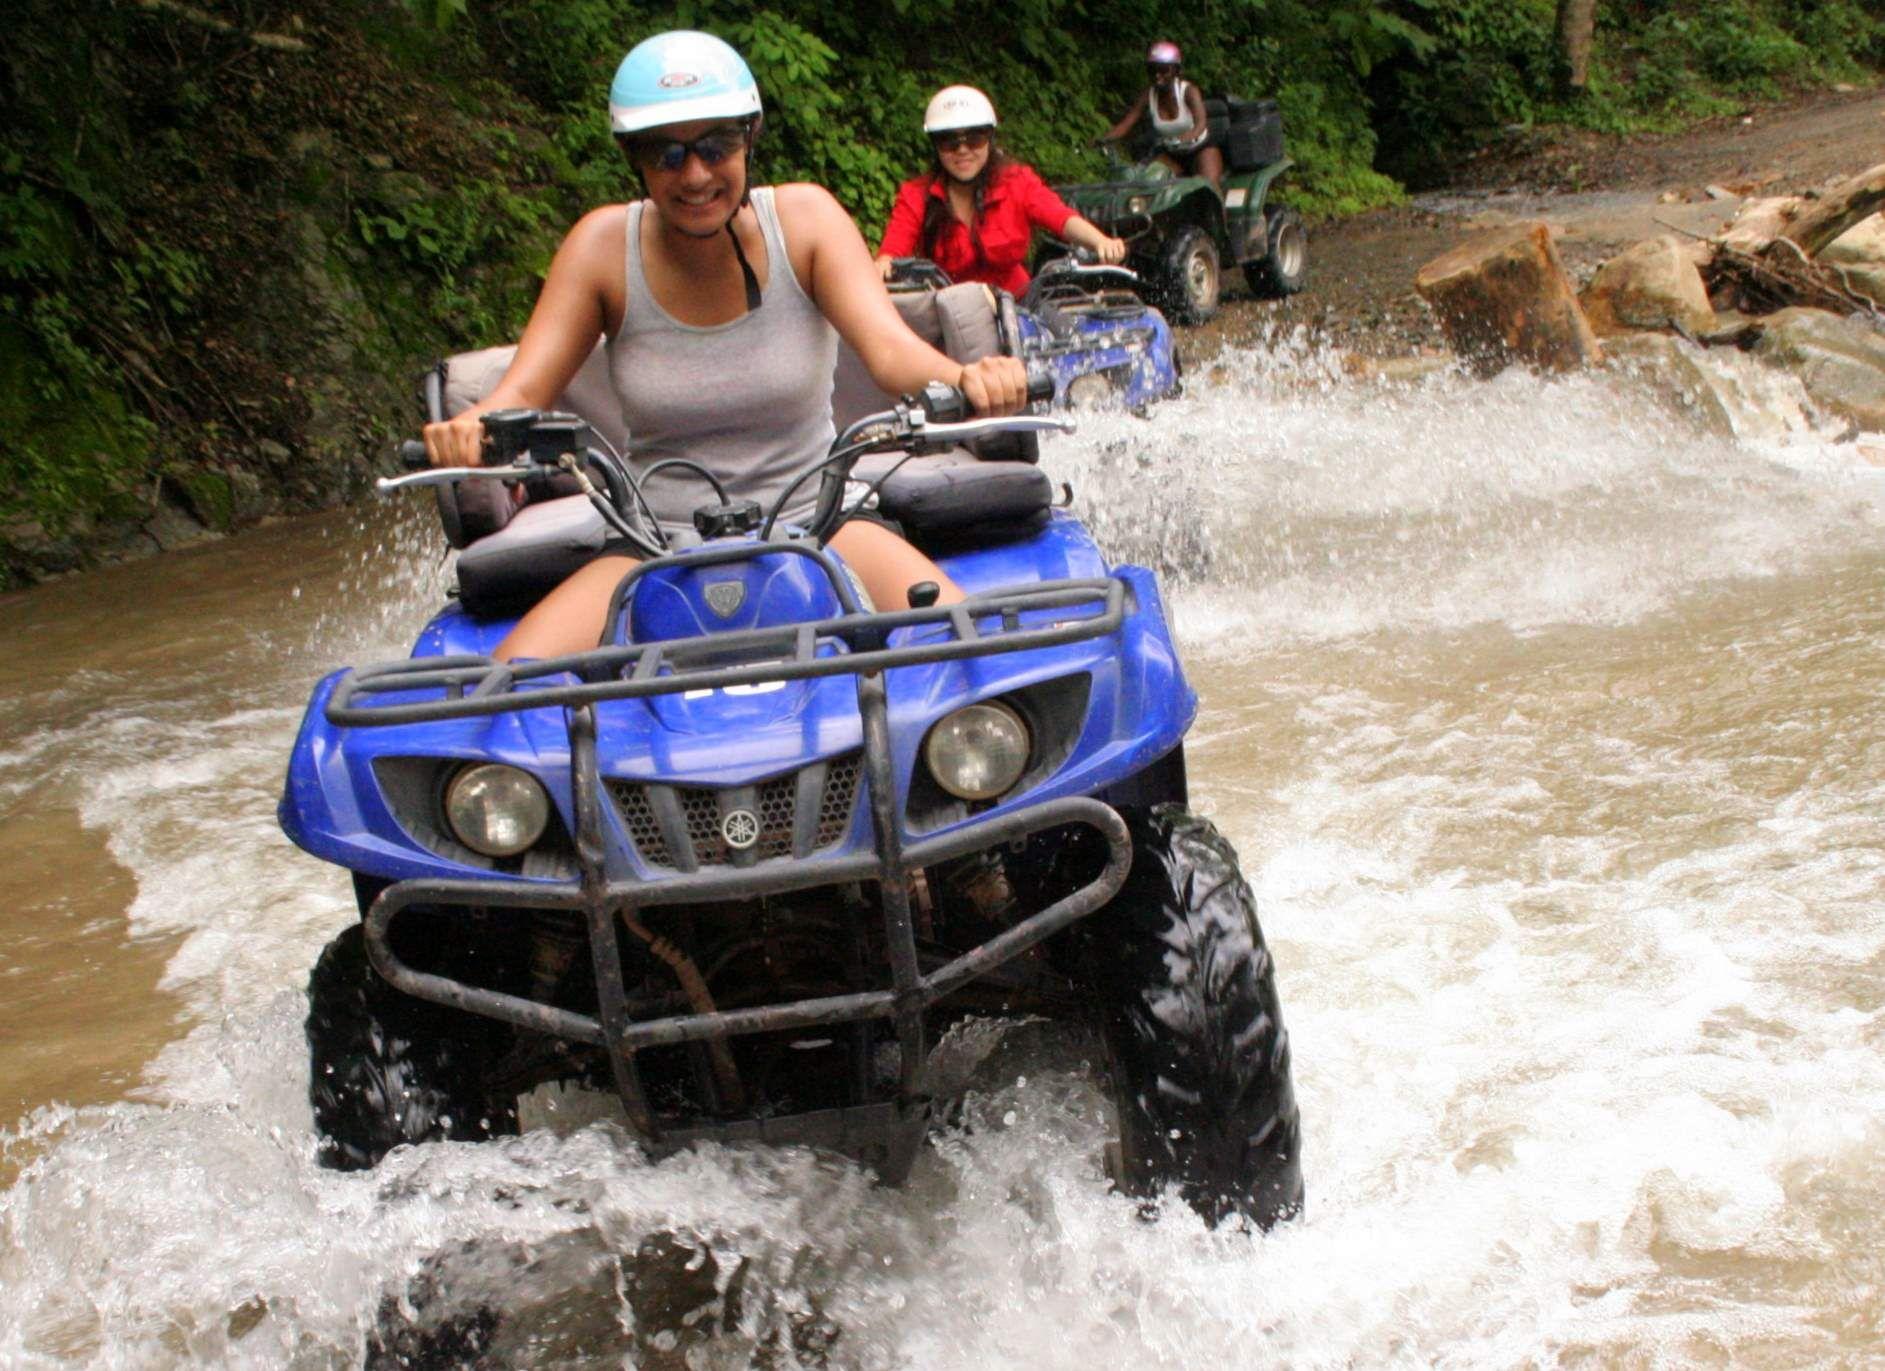 inertia tours spring break 2015 south padre island inertiatours